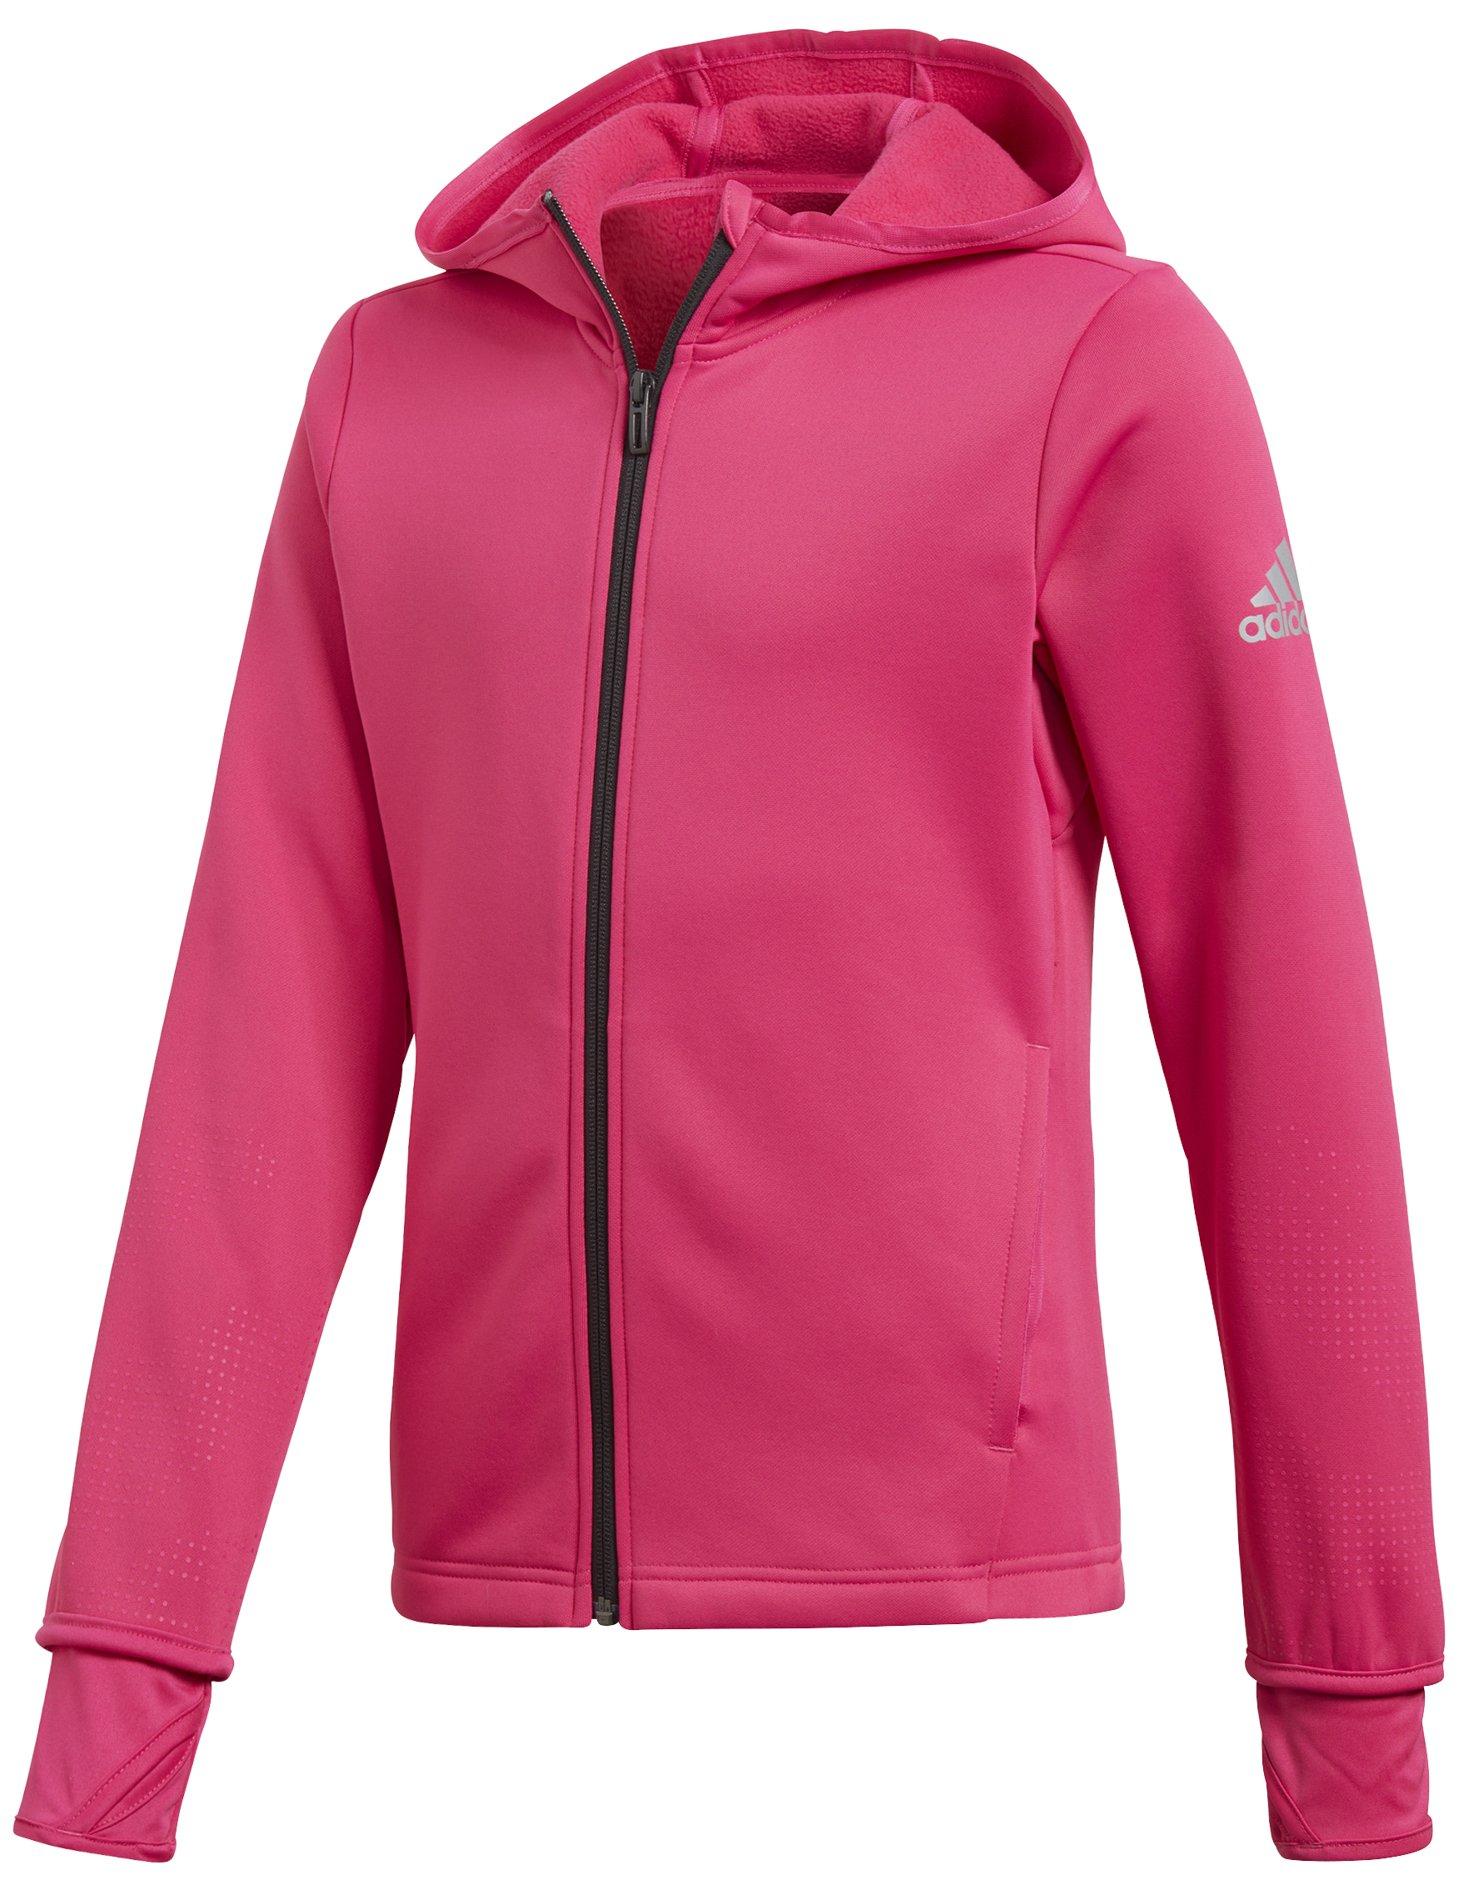 Adidas Full Zip Climawarm Hoodie - Sportby 6d2af1b267a